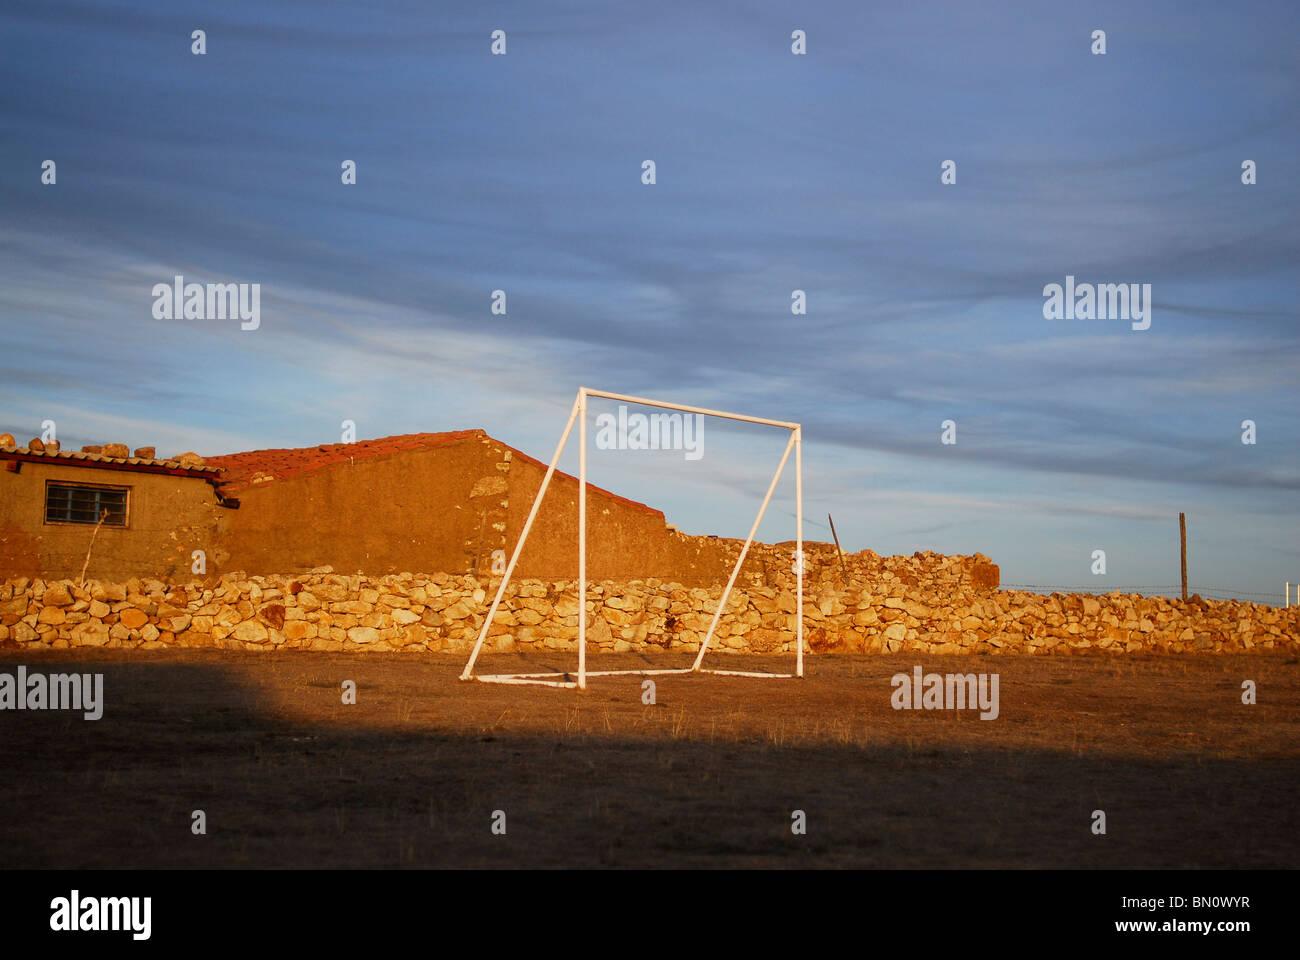 Porteria, provincia de Salamanca. España. Objetivo en la provincia de Salamanca, España. Imagen De Stock